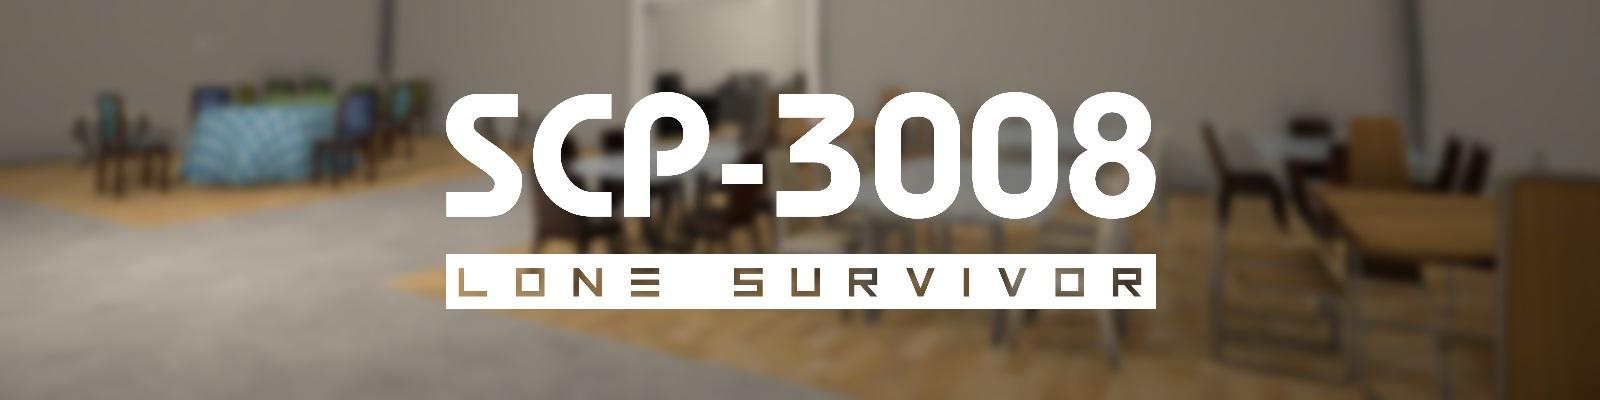 Scp 3008 Thaumiel Games All templates / create meme scp foundation logo, scp of thaumiel logo, scp emblem of thaumiel. thaumiel games